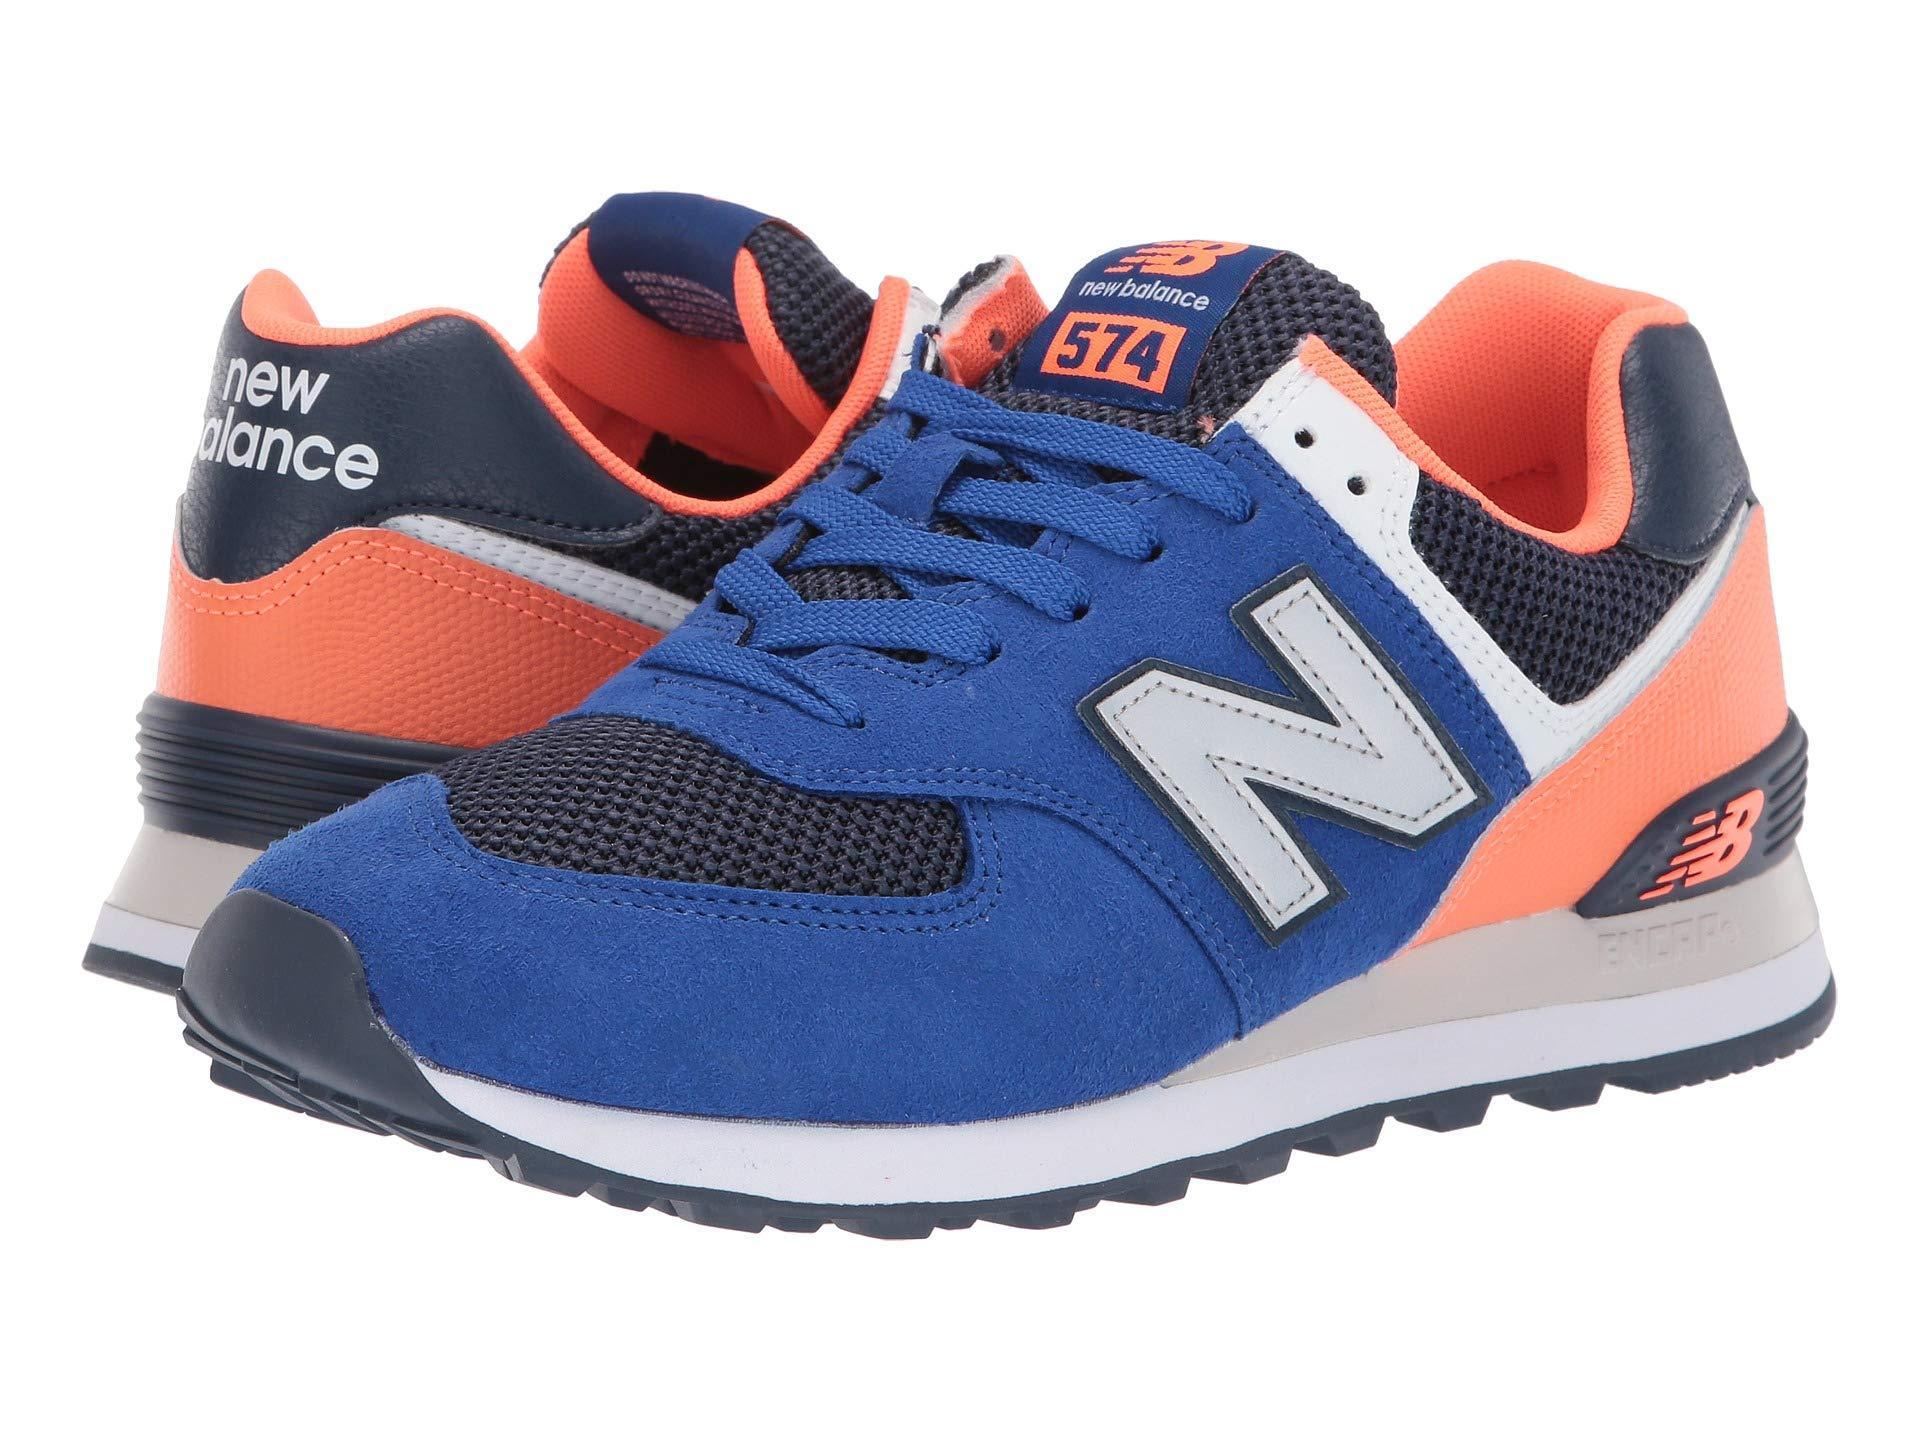 save off 31665 a4e49 Blue 574v2-usa (vintage Indigo/reflection) Men's Shoes